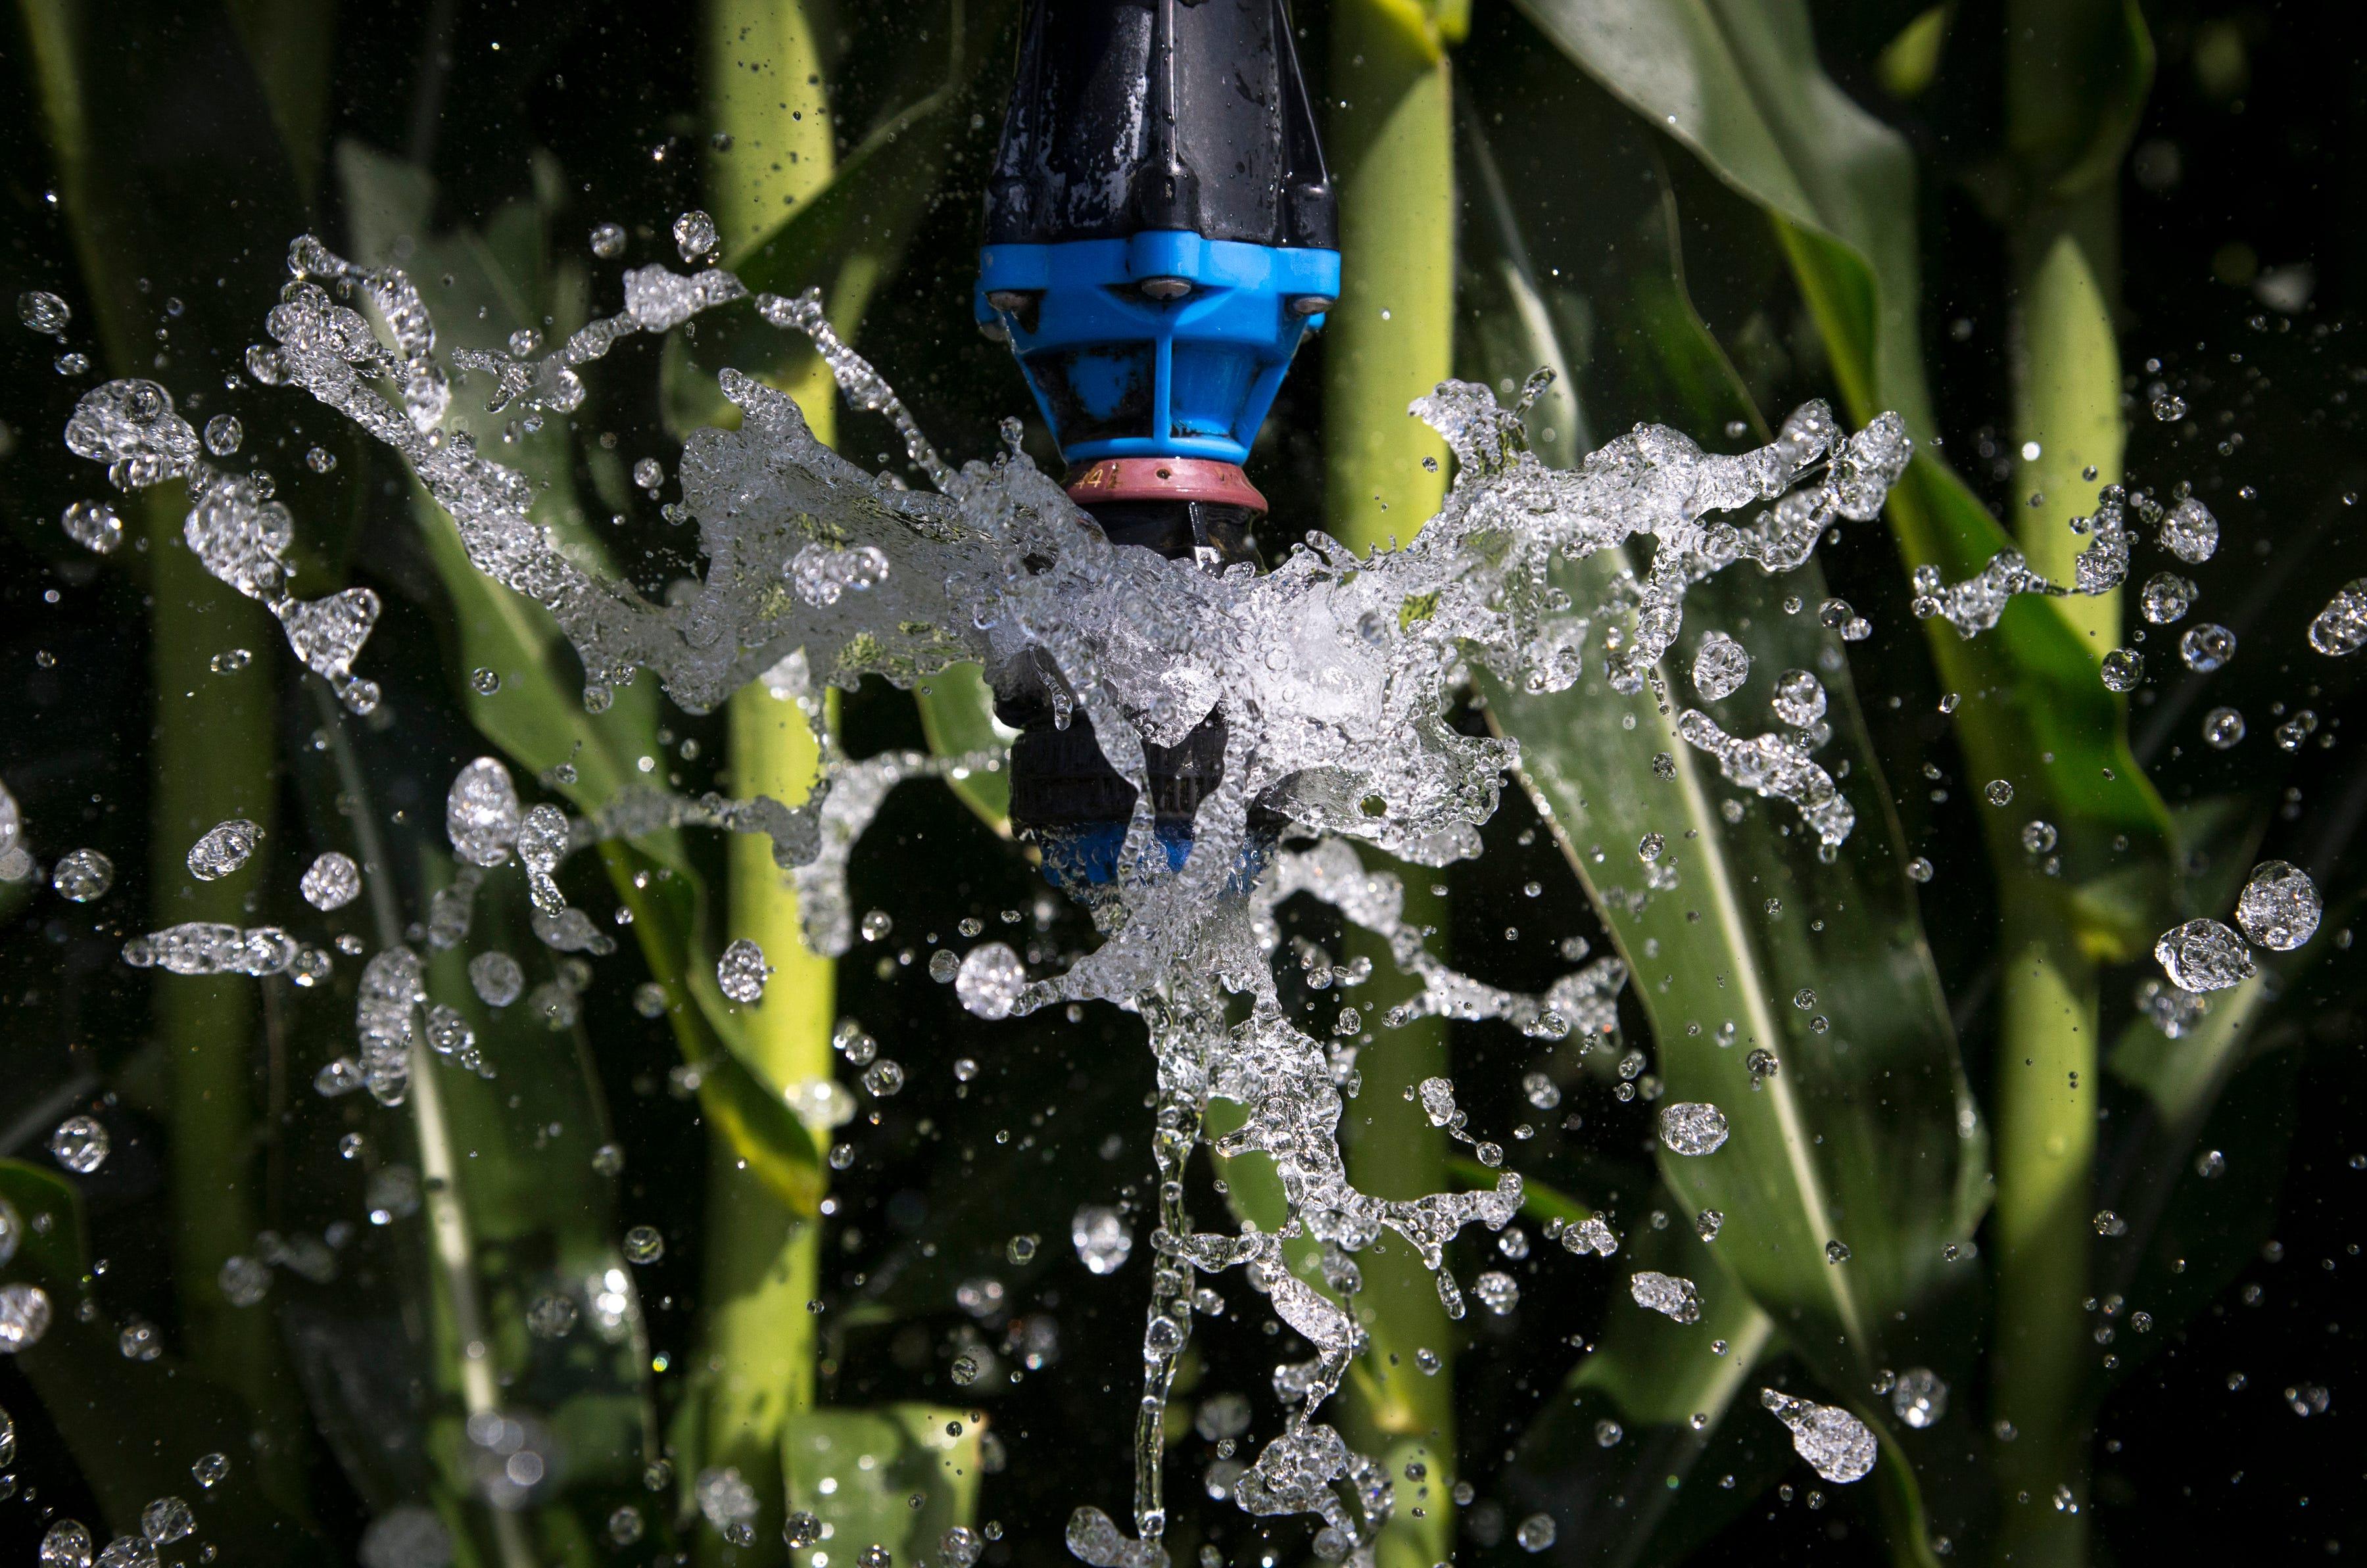 Irrigating corn, August 15, 2019, at Wagon Wheel Farms, Kansas Settlement, Arizona.